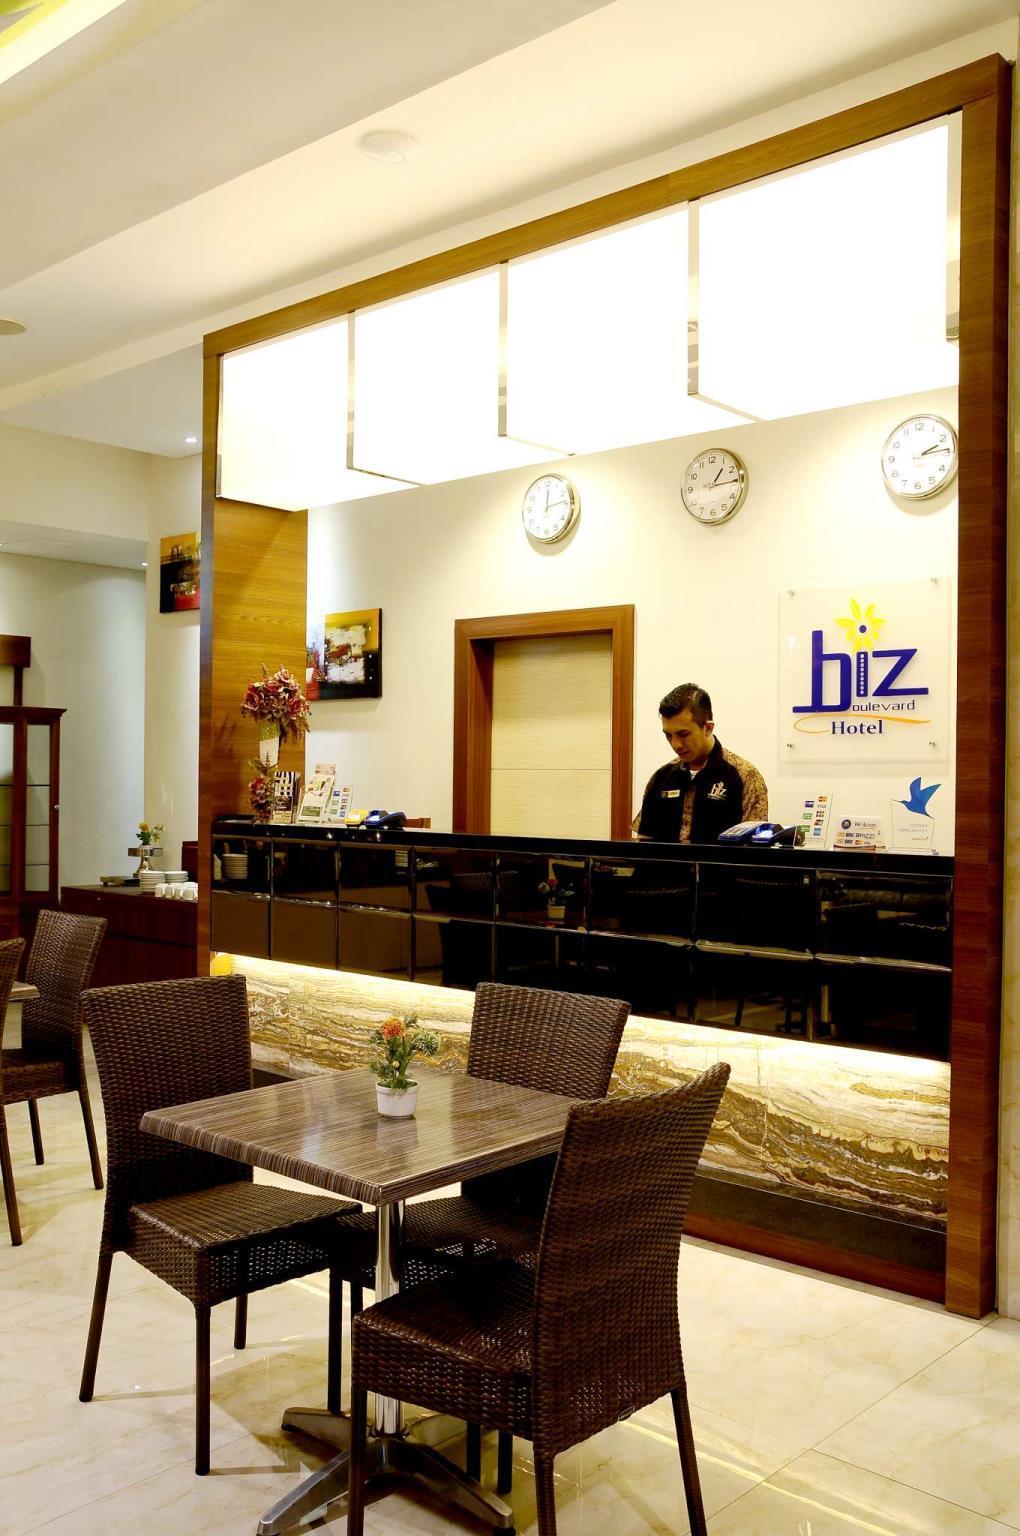 Biz Boulevard Hotel Manado